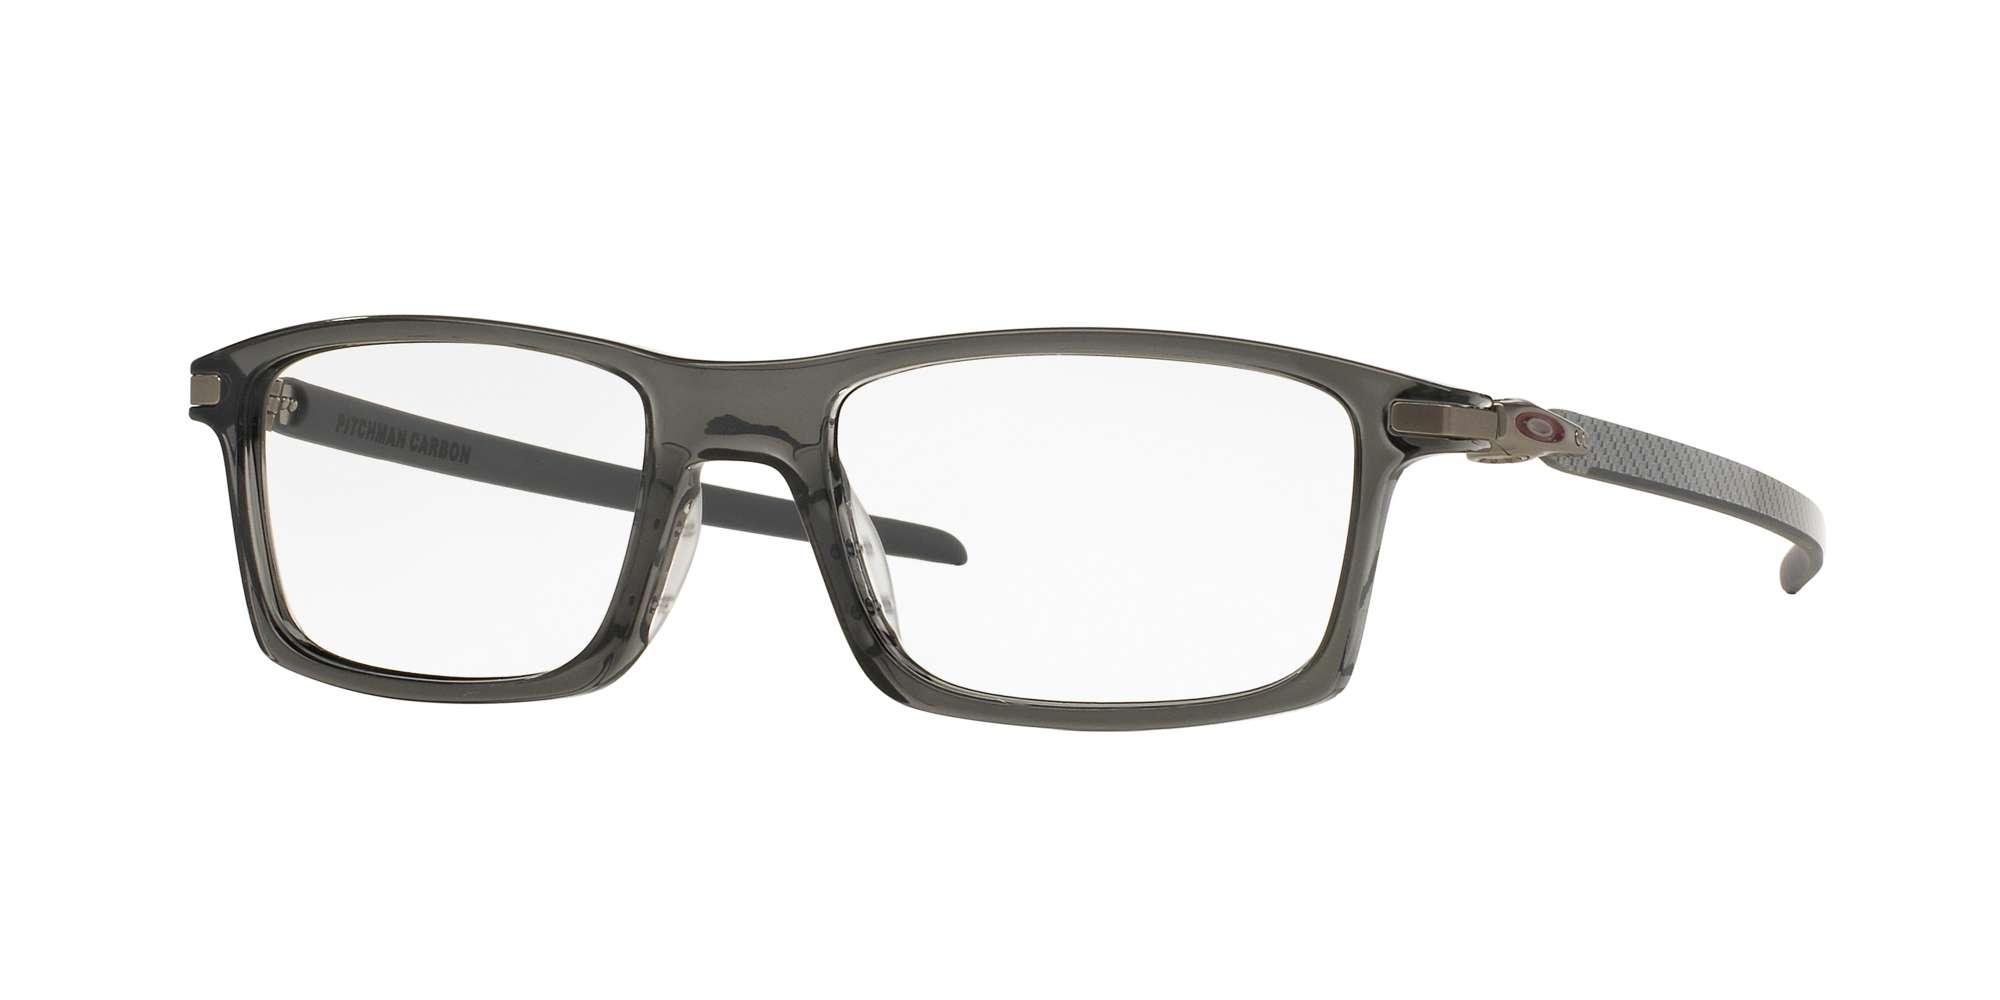 GREY SMOKE / CLEAR lenses